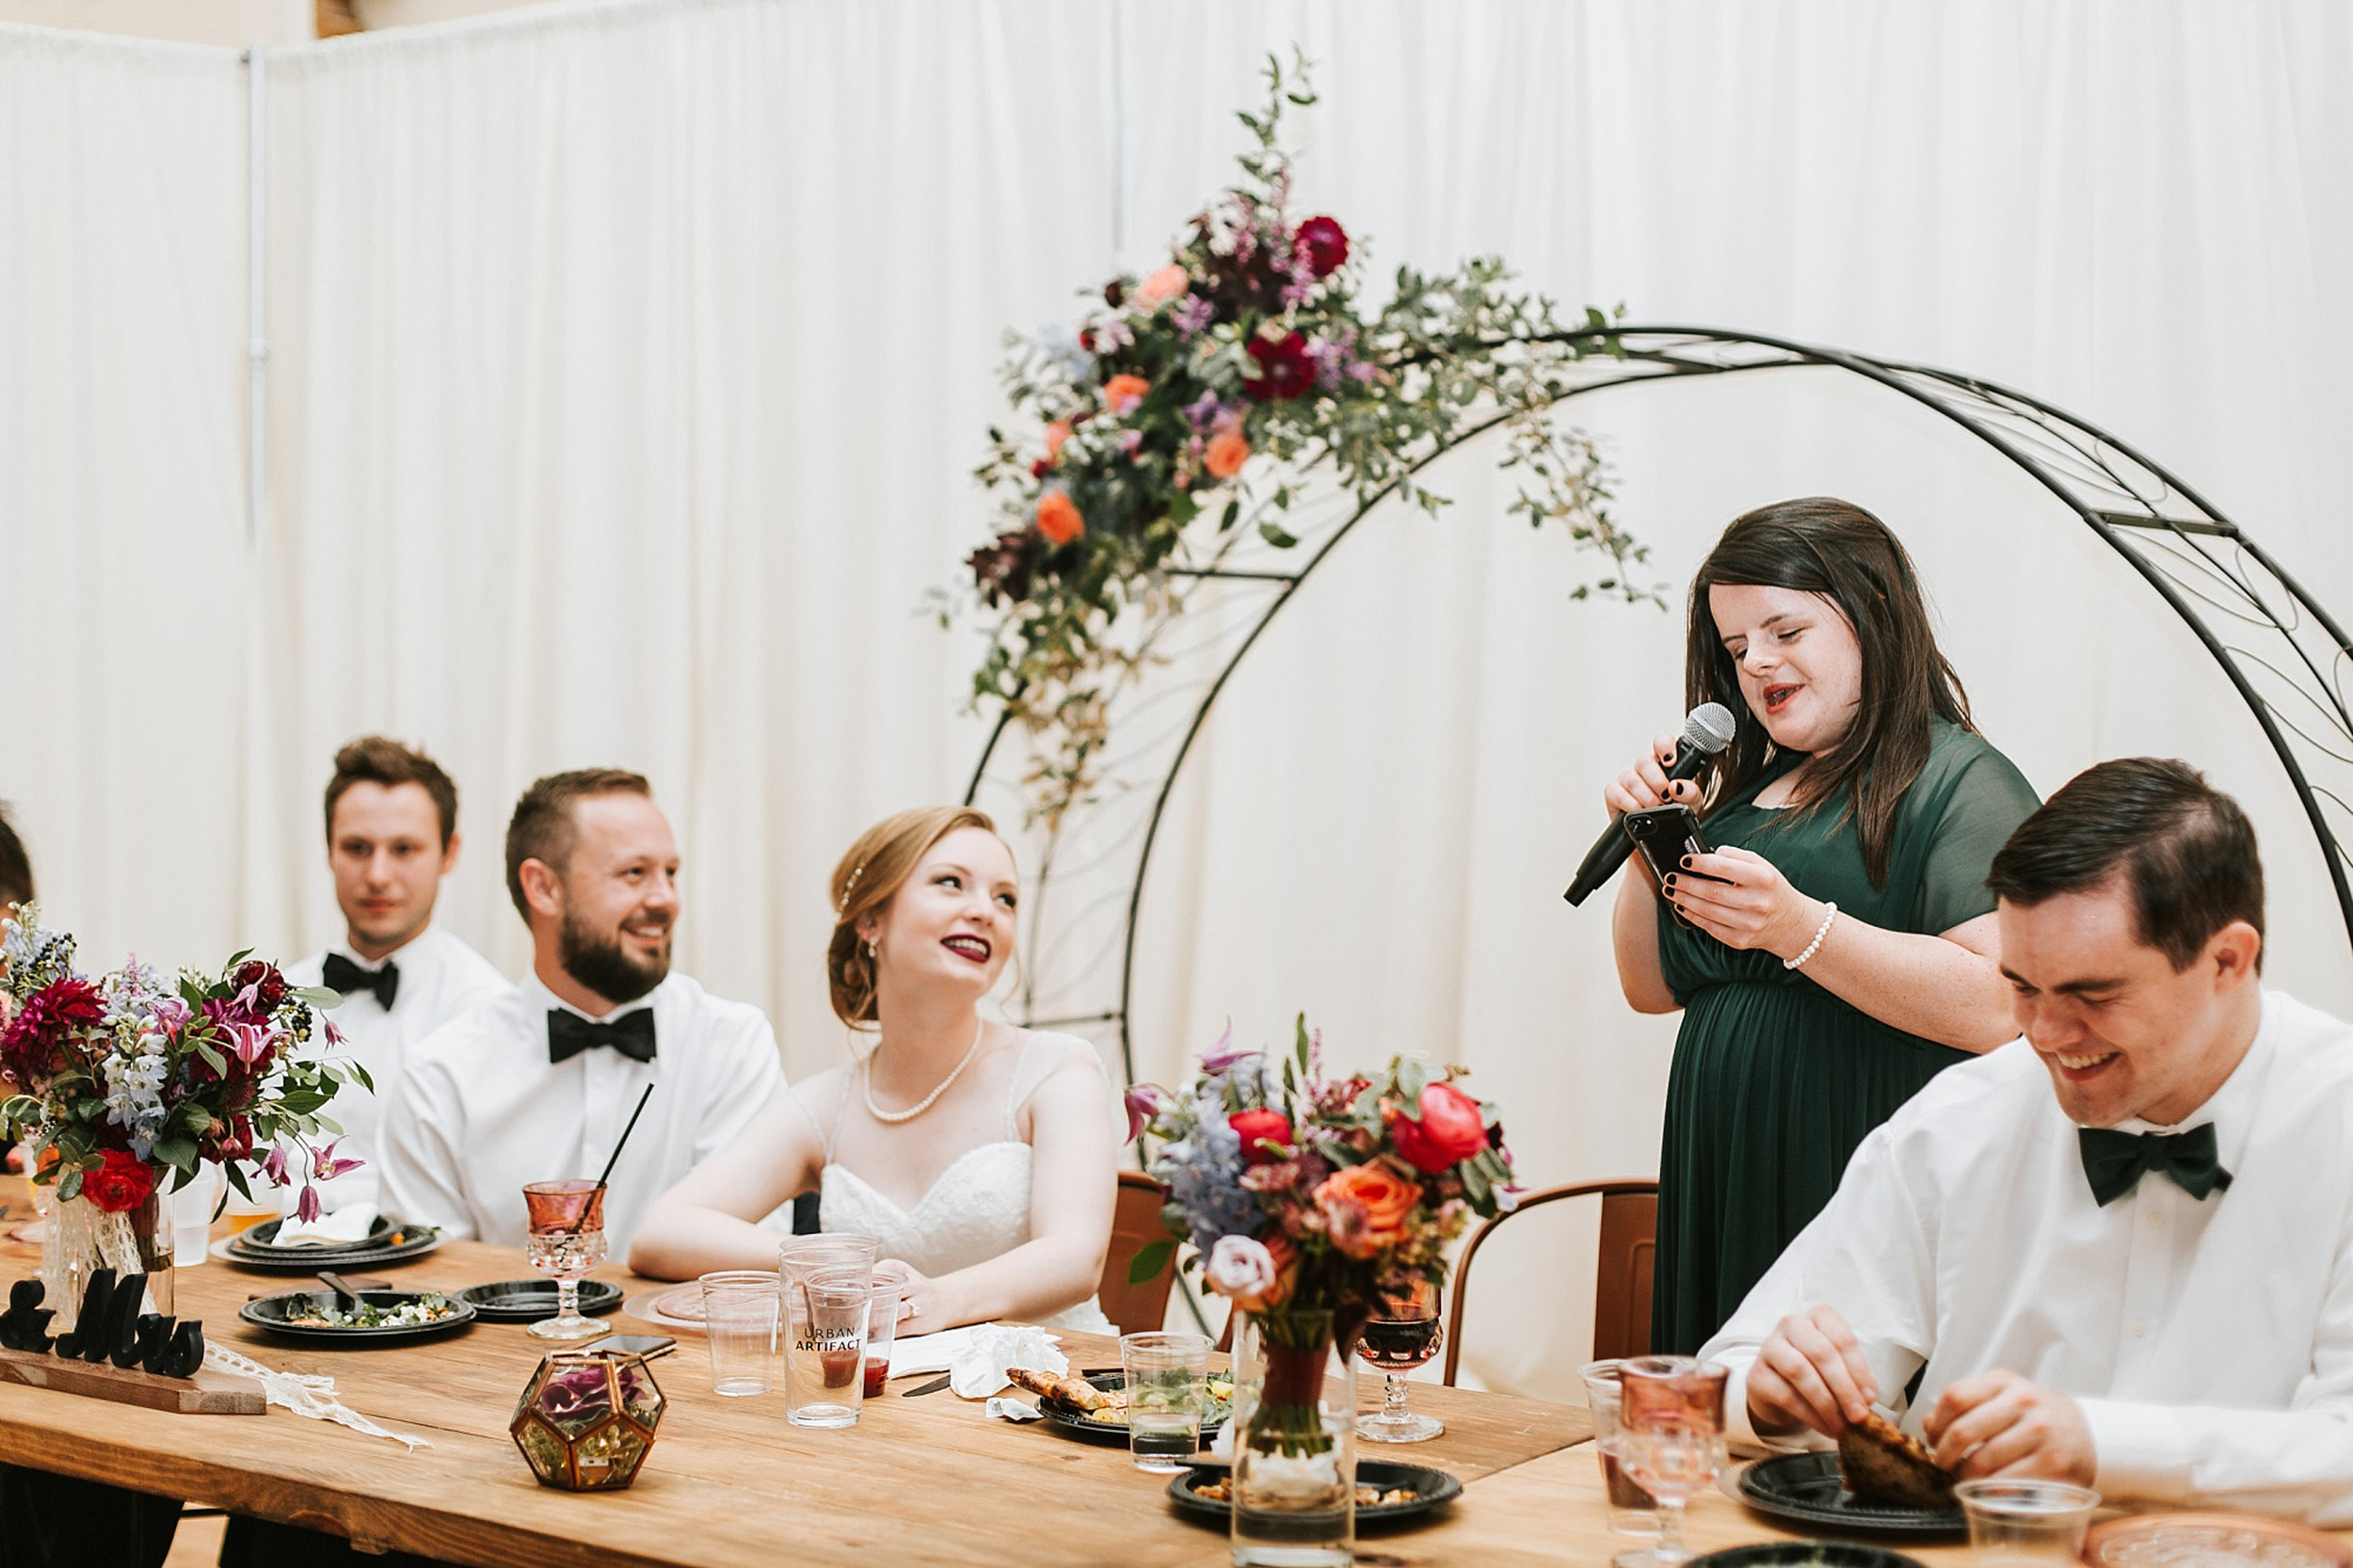 Brooke Townsend Photography - Ohio Wedding Photographer-195.jpg